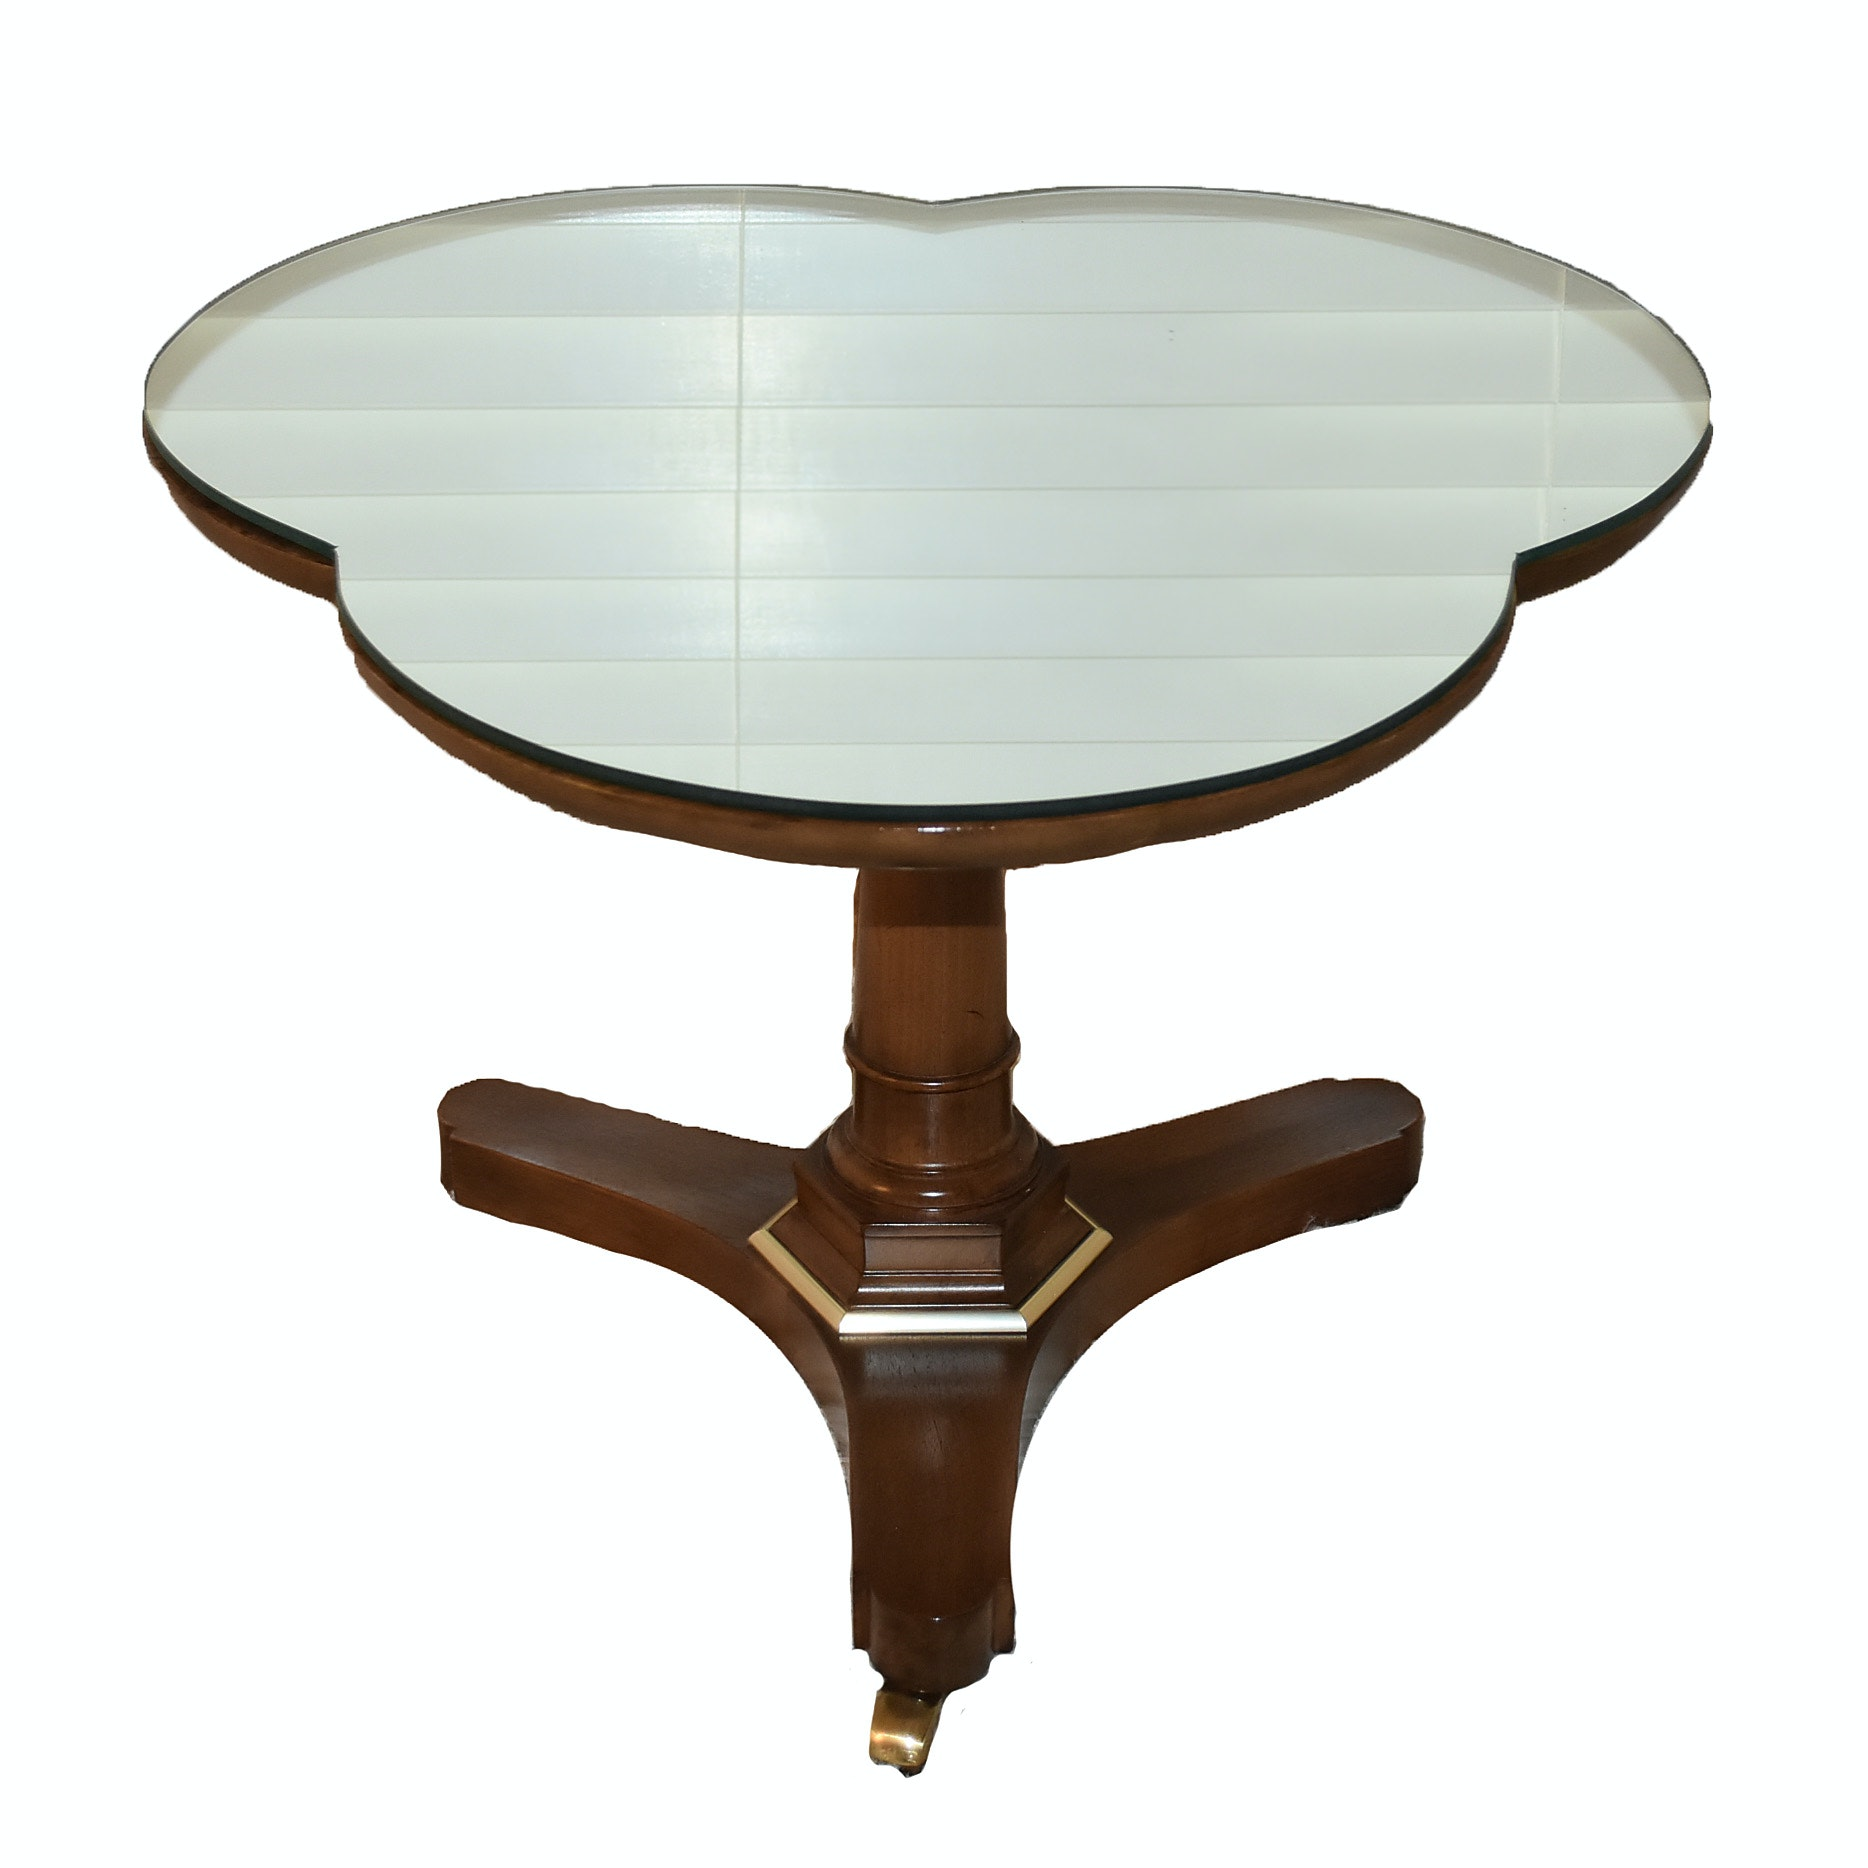 Empire Style Mahogany Mirrored Trefoil Top Table, Early 20th Century